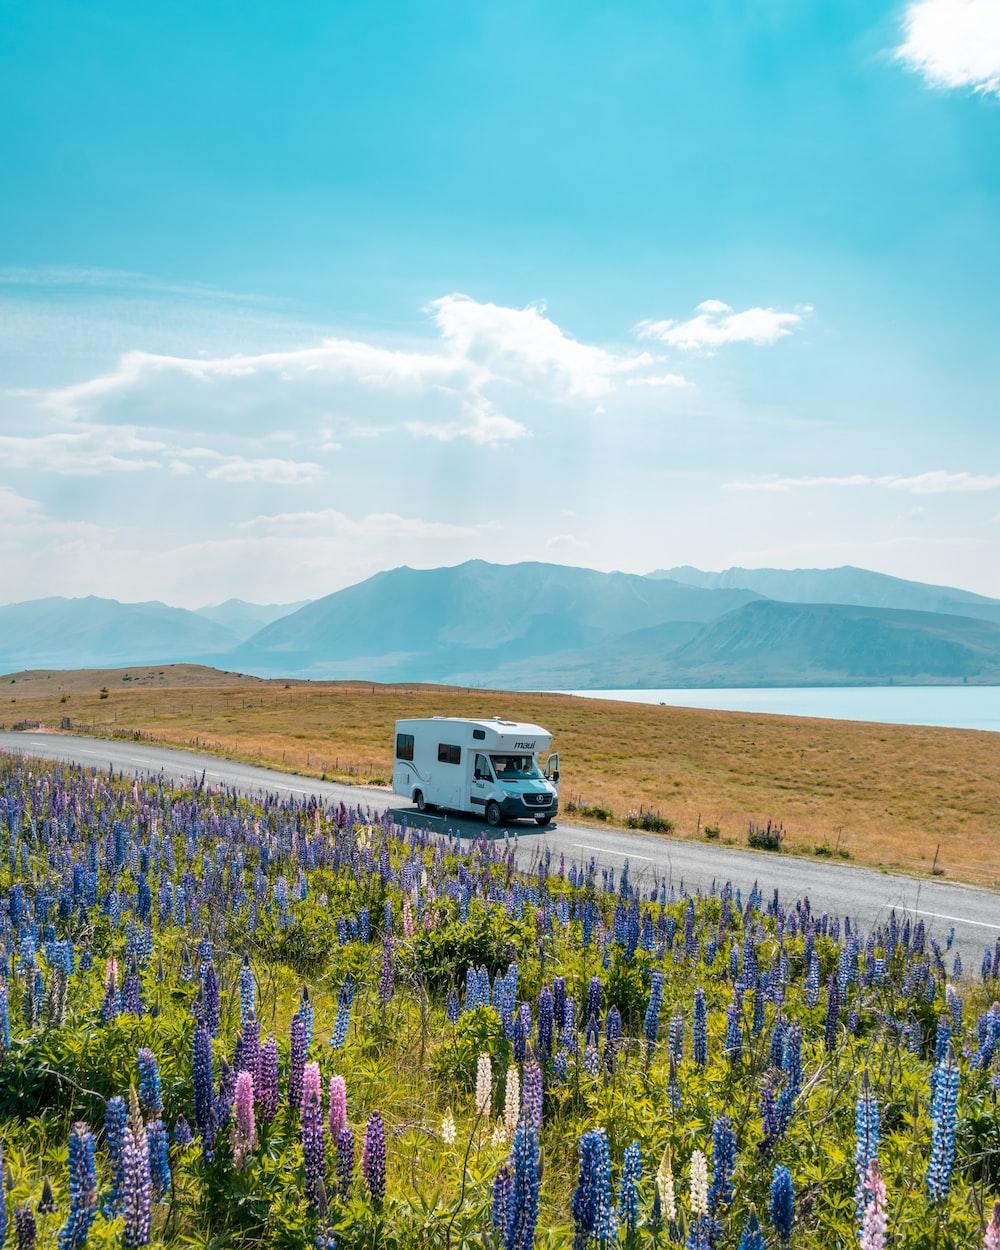 white van on road near green grass field during daytime